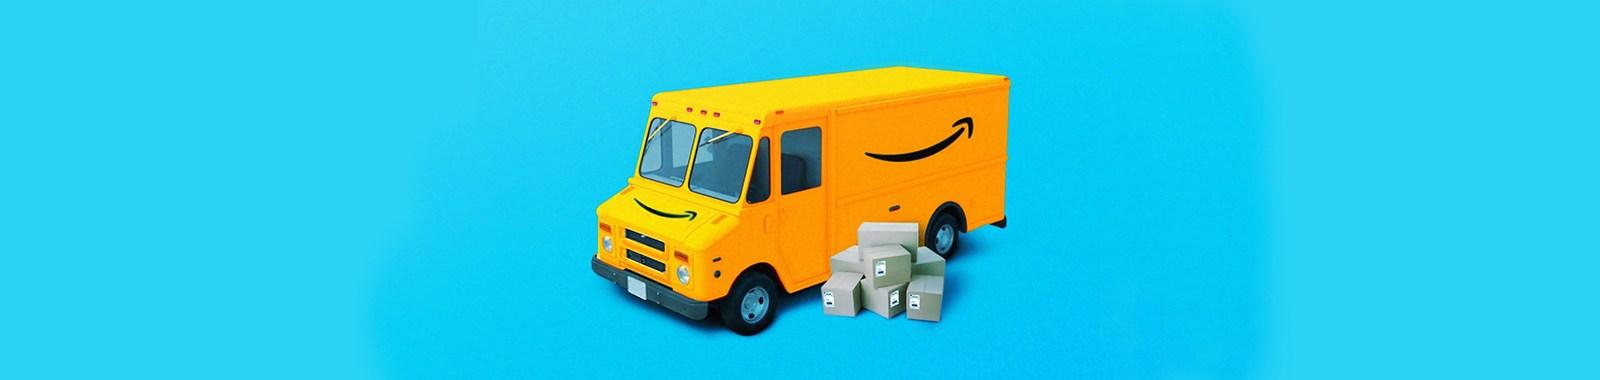 amazon-truck-unsplash-eye